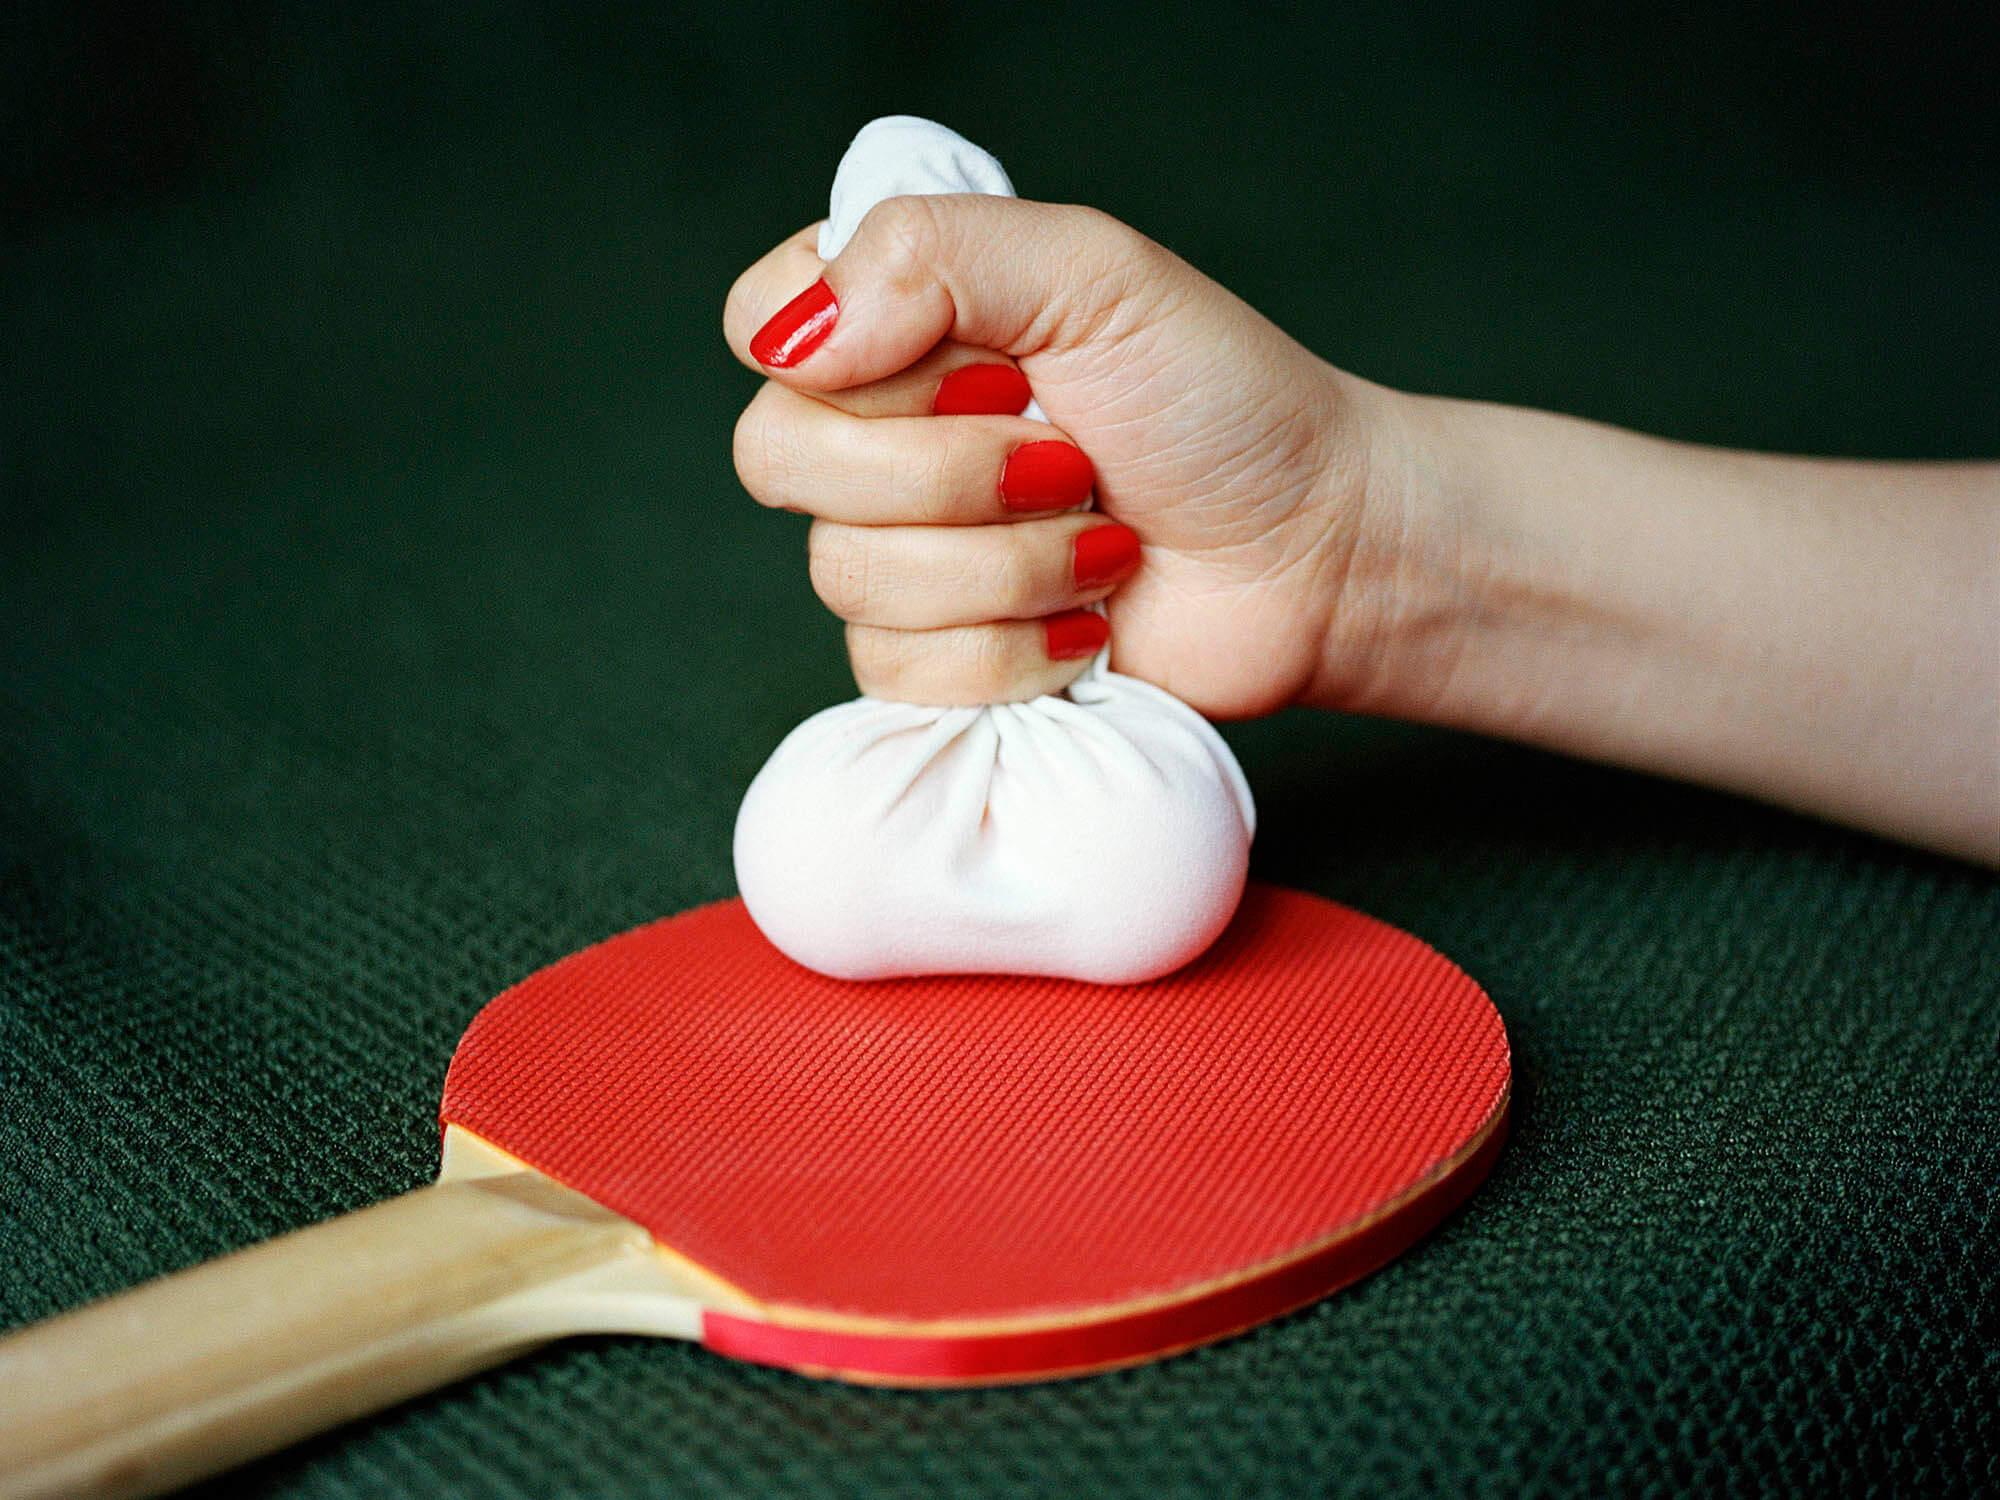 liao_2013_ping-pong-balls-375×50-1